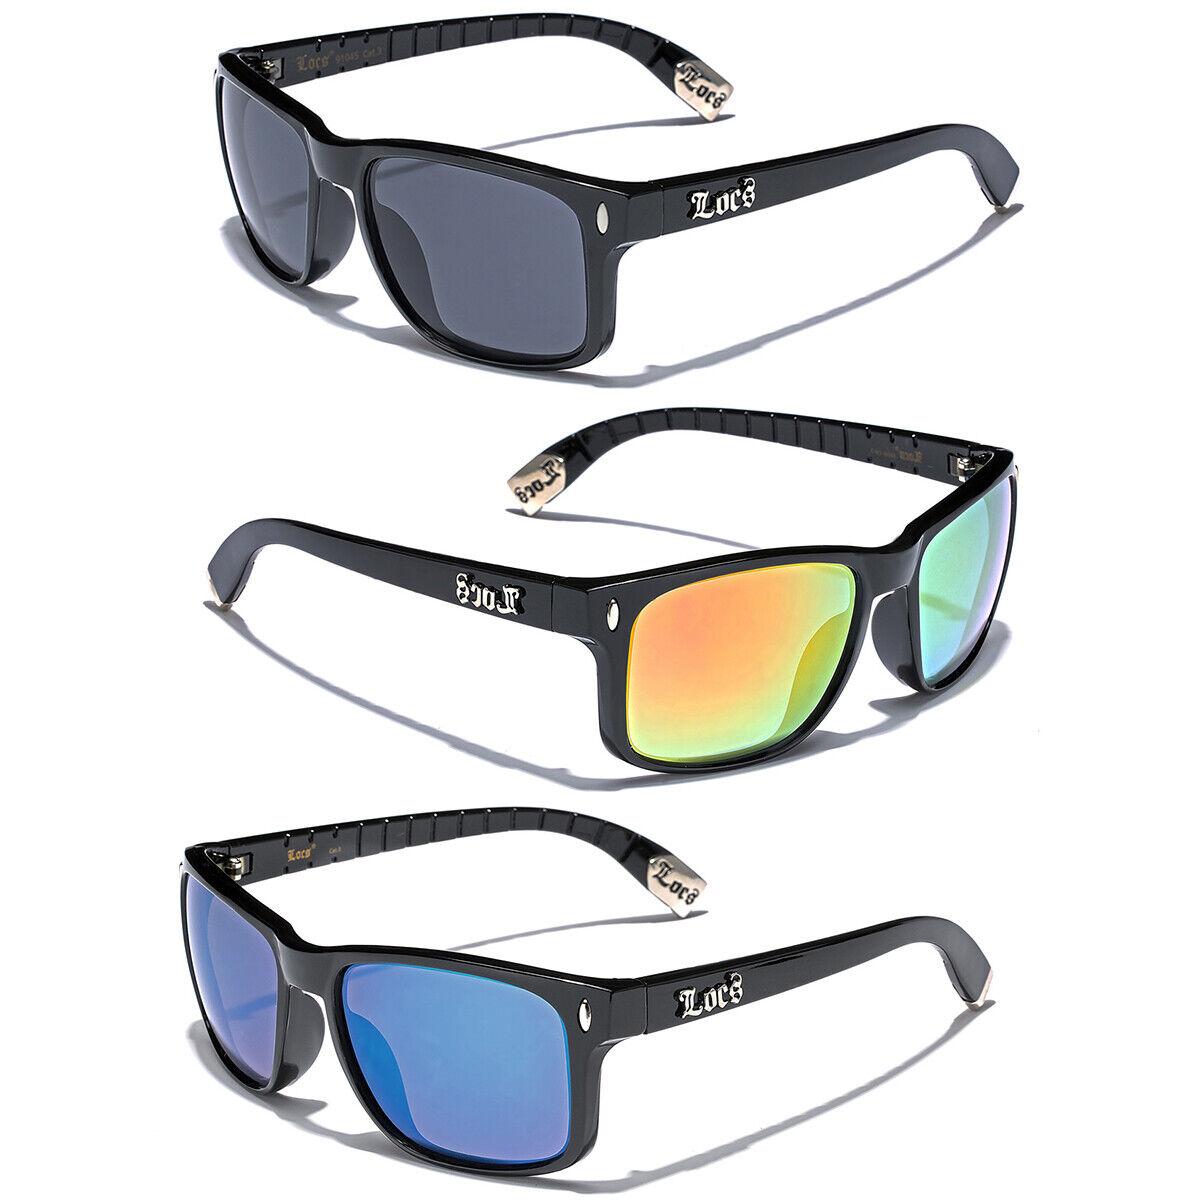 Black Locs Square Men Mirrored Dark Sunglasses Cholo Gangste